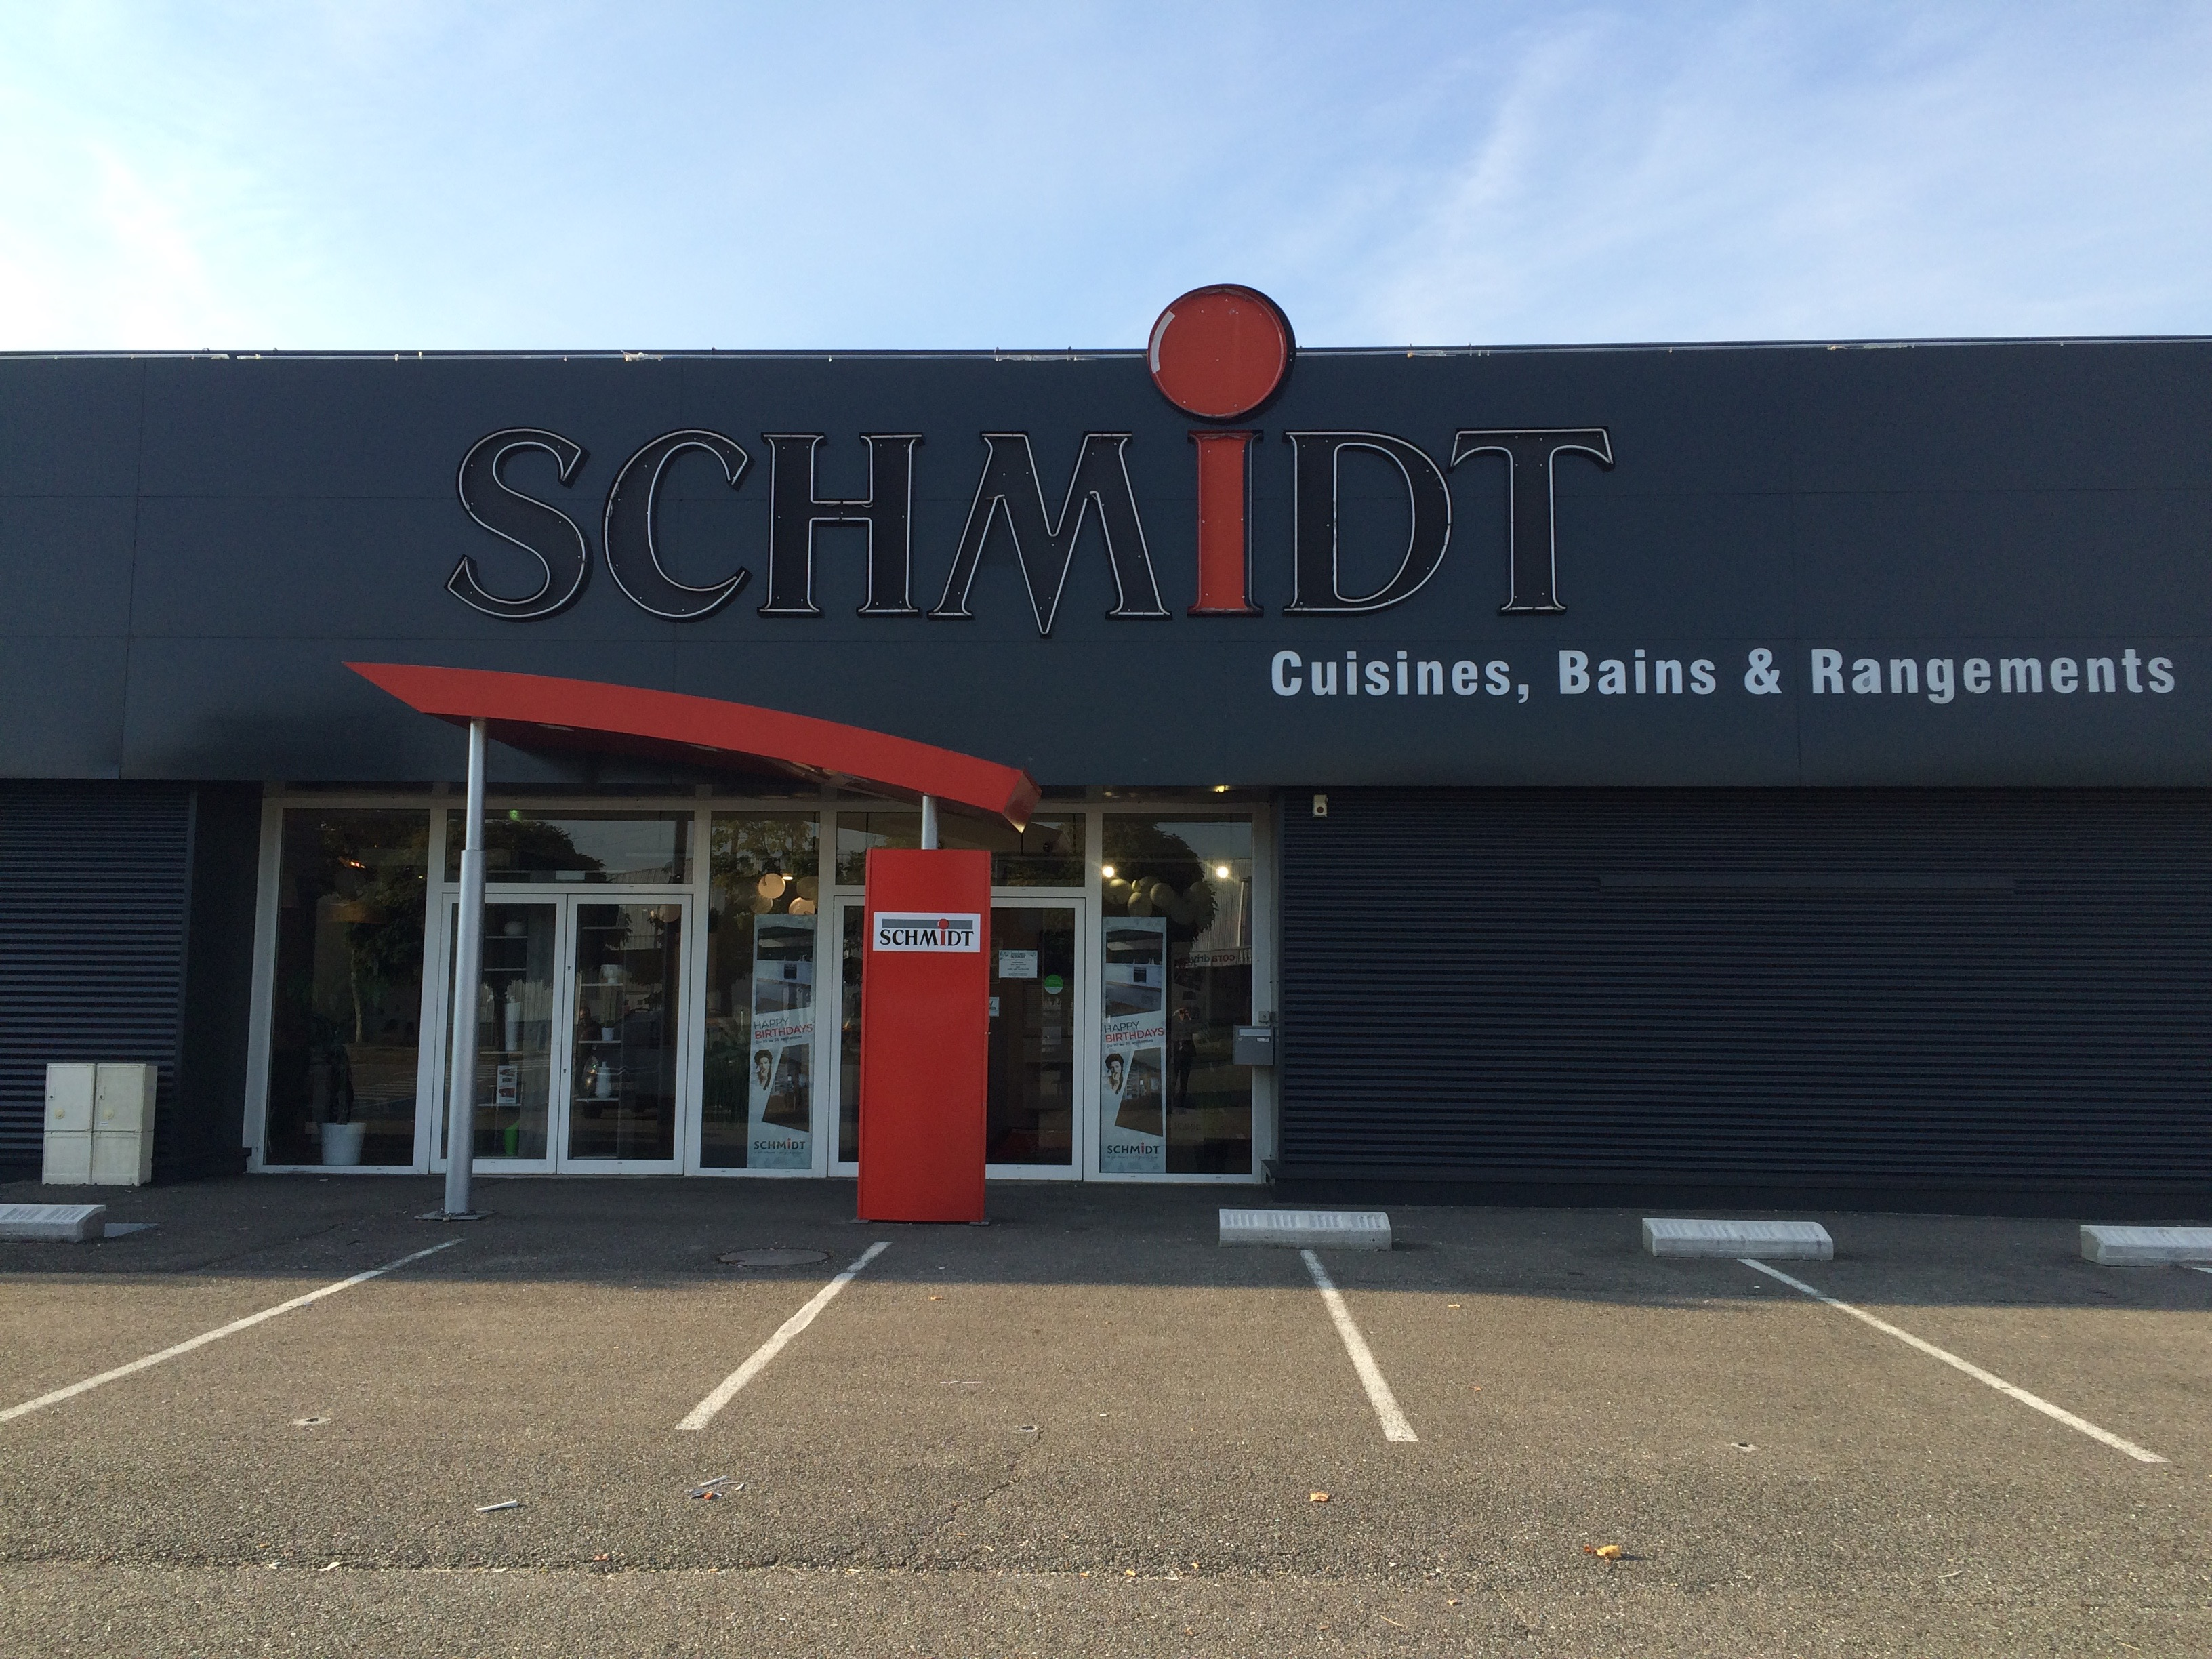 Votre magasin schmidt dorlisheim cuisines rangements - Cuisine schmidt dorlisheim ...